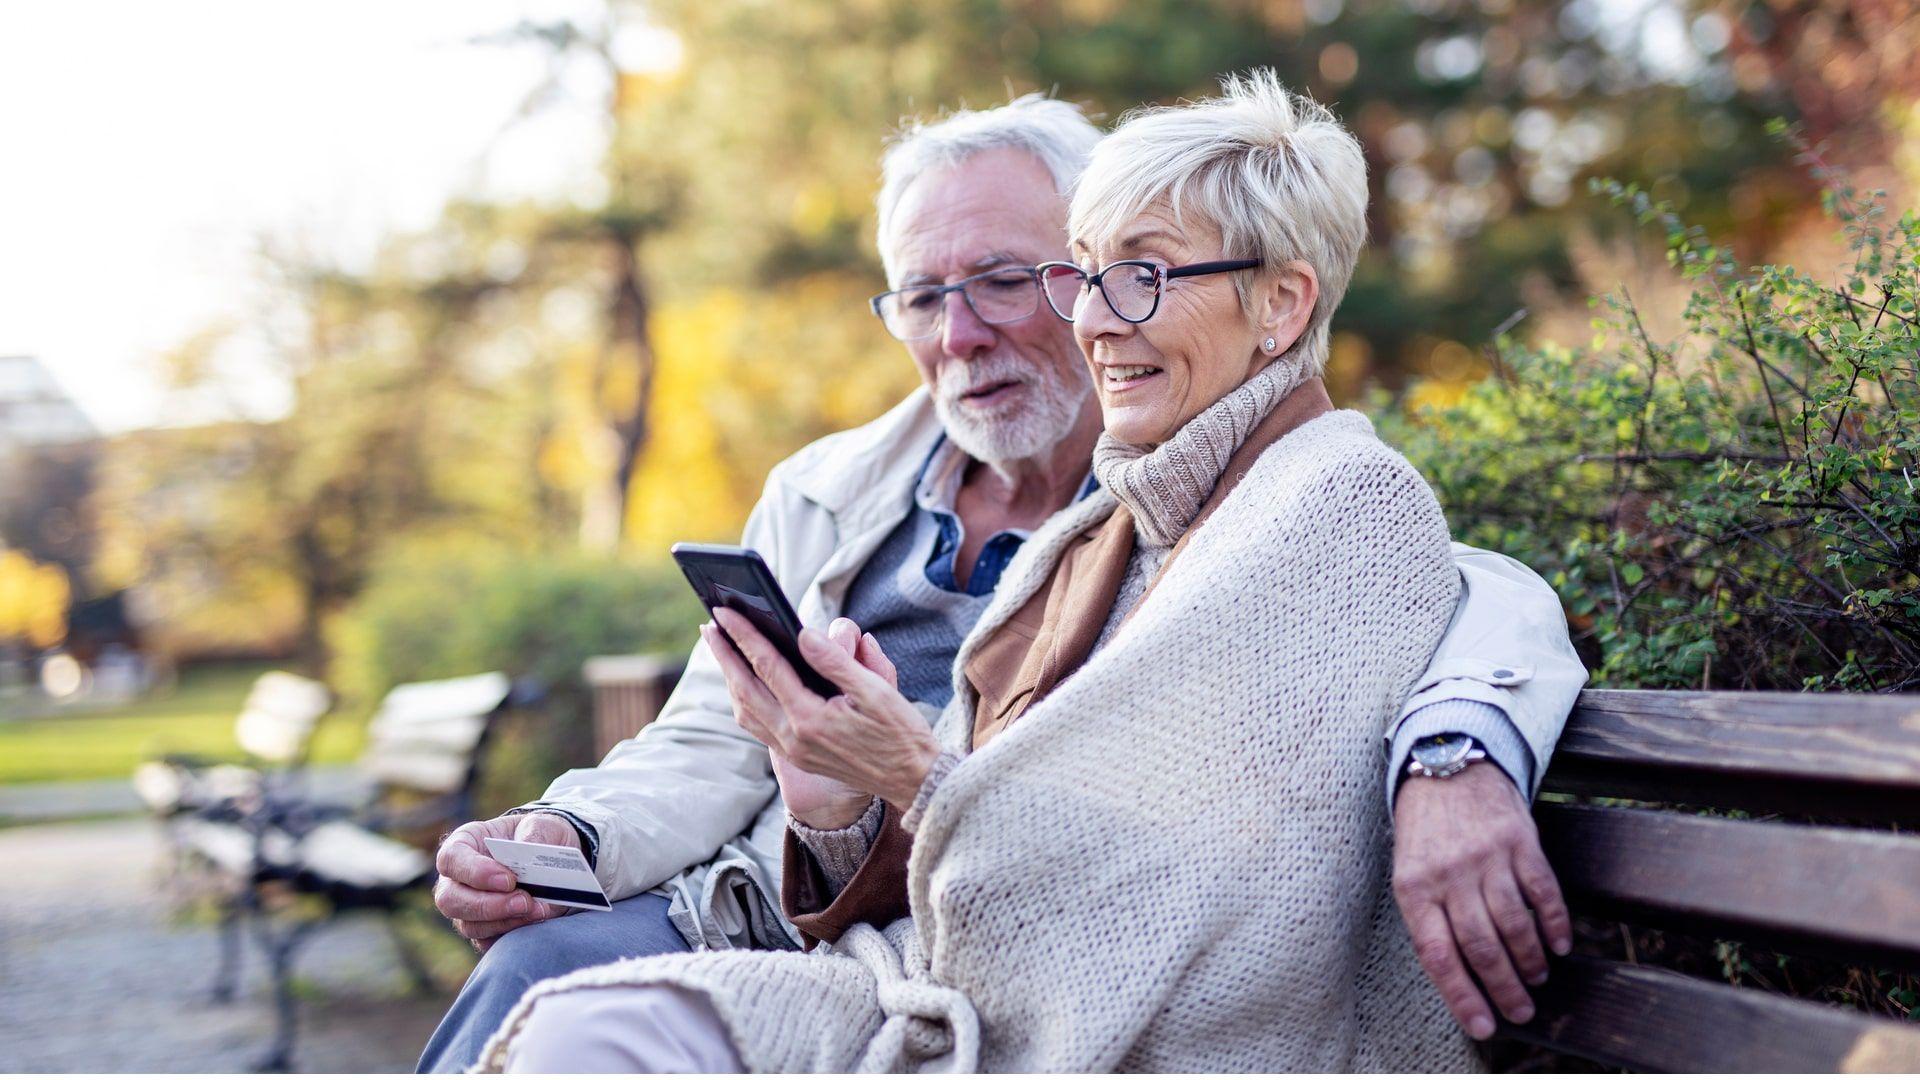 Celular para idoso: 5 modelos para básicos e baratos para comprar (Foto: Shutterstock)